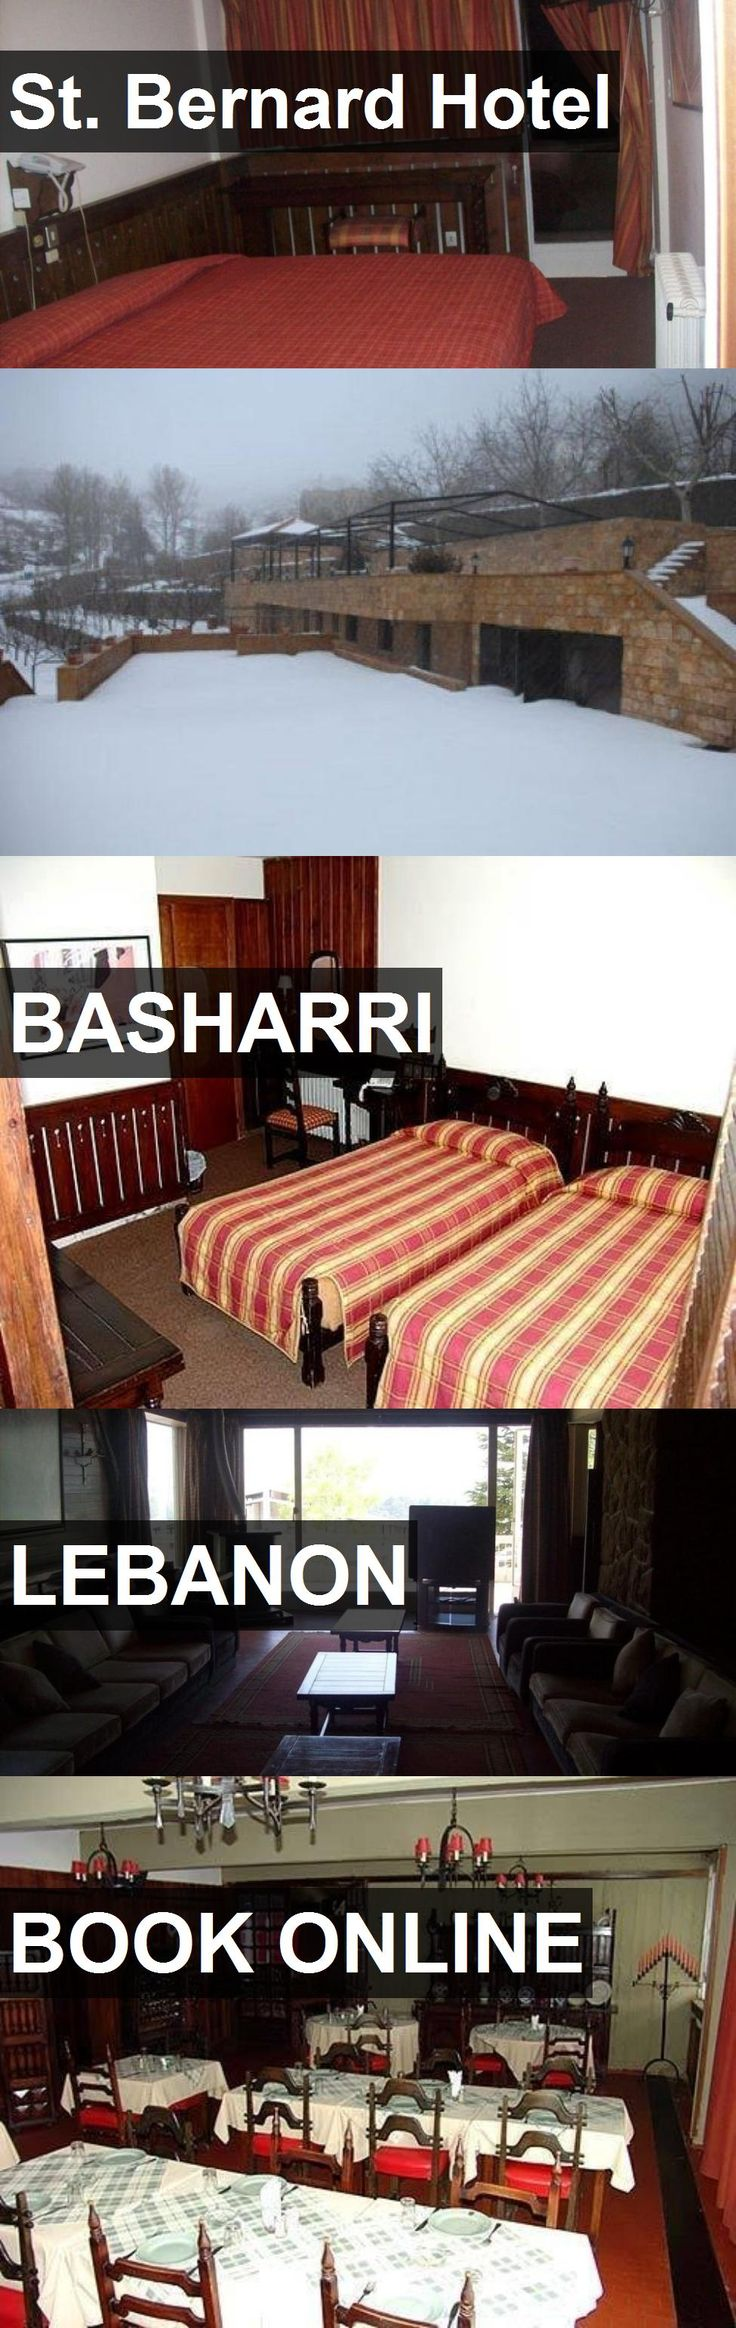 Hotel St. Bernard Hotel in Basharri, Lebanon. For more information, photos, reviews and best prices please follow the link. #Lebanon #Basharri #St.BernardHotel #hotel #travel #vacation